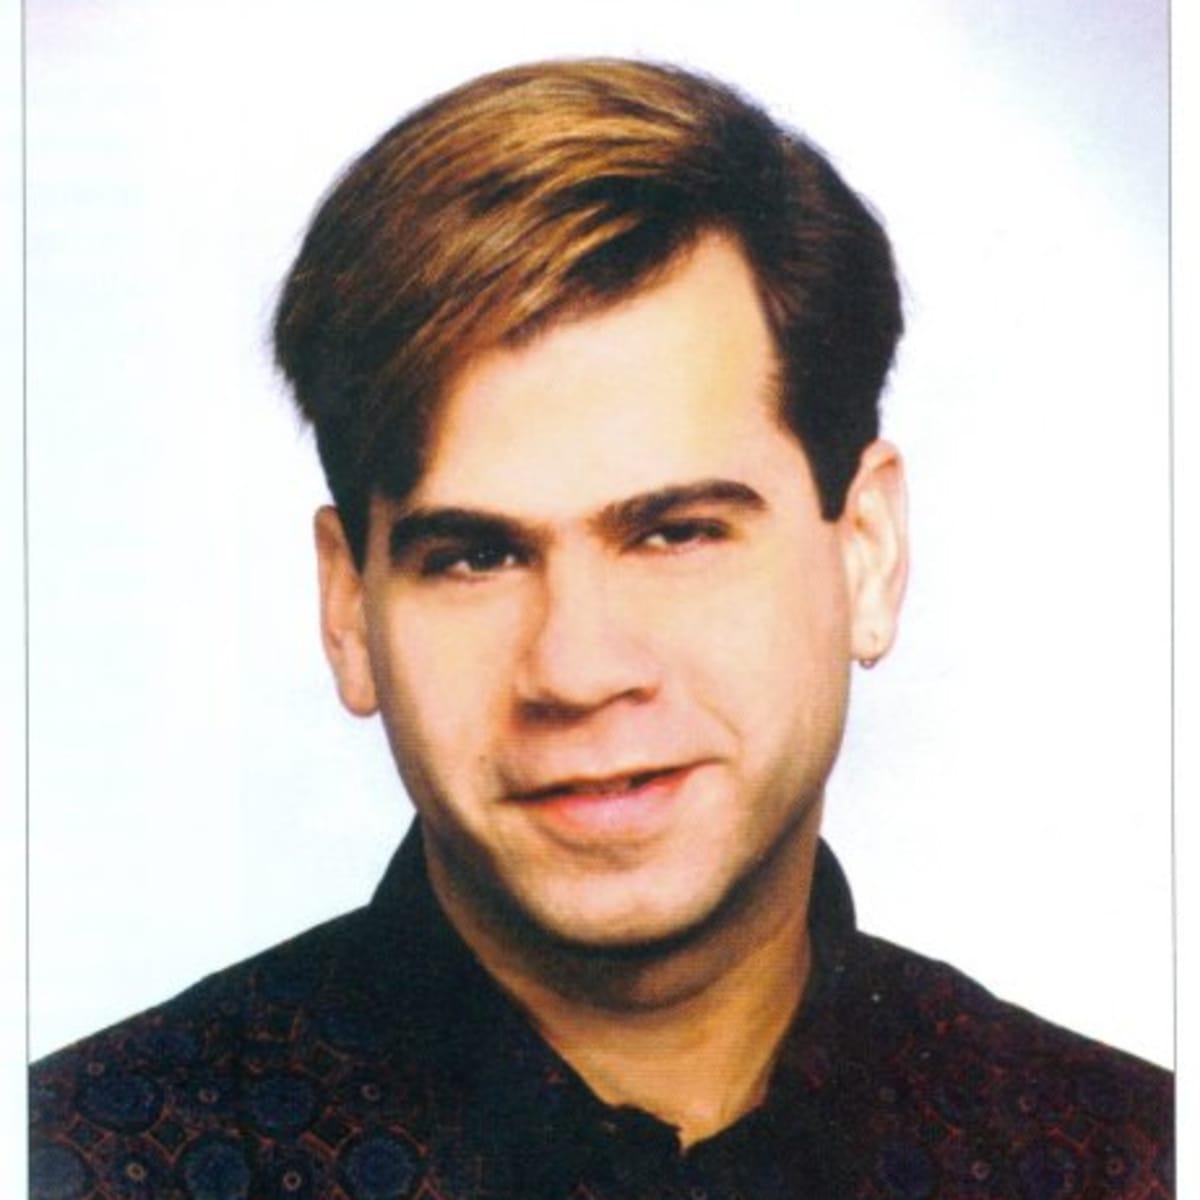 Paul Broussard